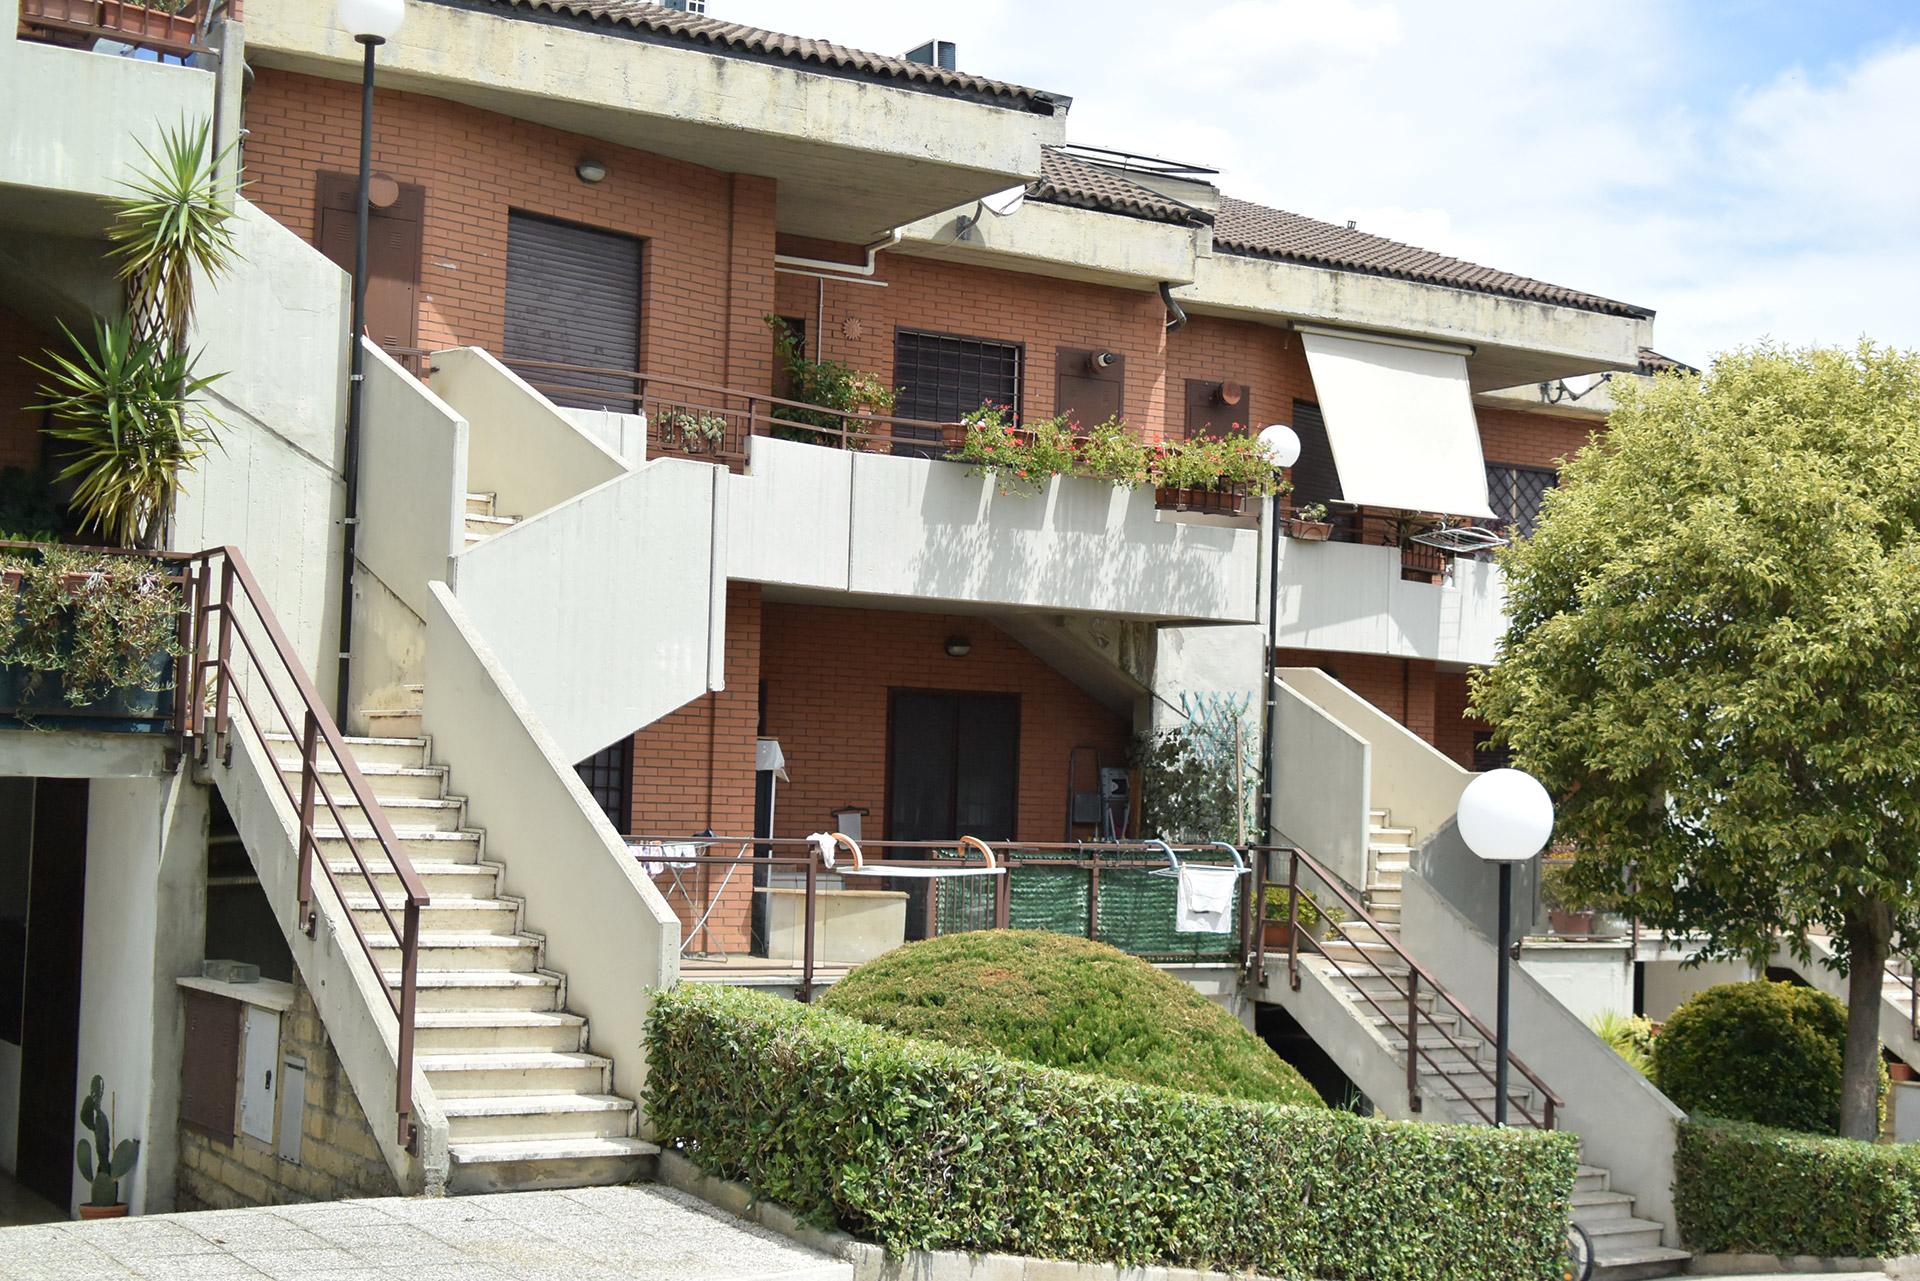 Immobiliare spinosi affitti roma for Affitti roma